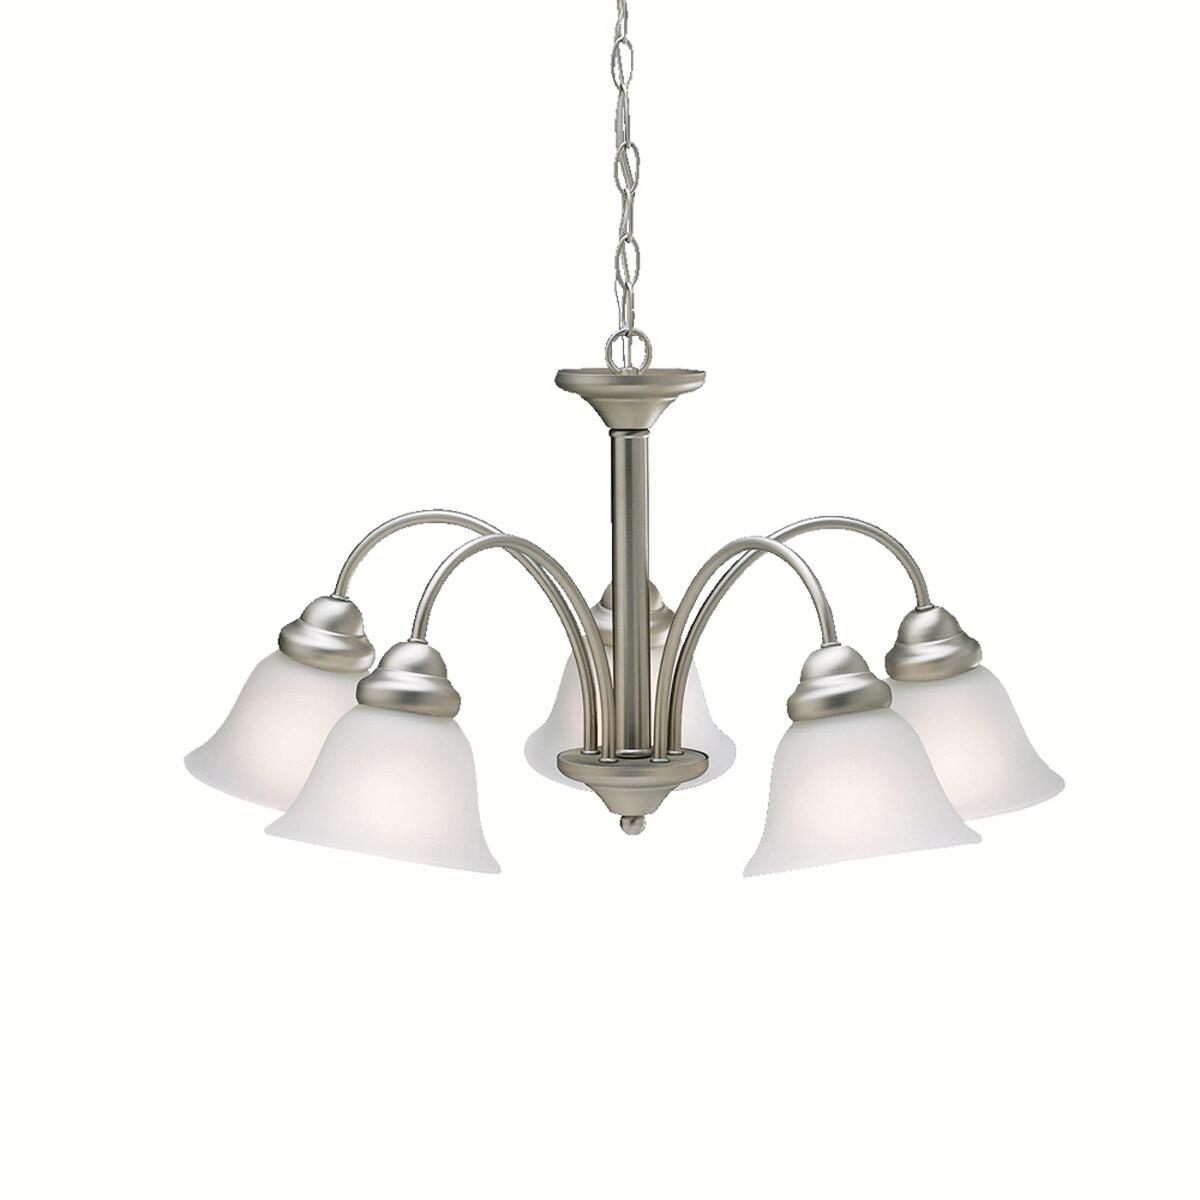 Kichler Lighting Wynberg 5 Light Chandelier In Brushed Nickel 2093ni